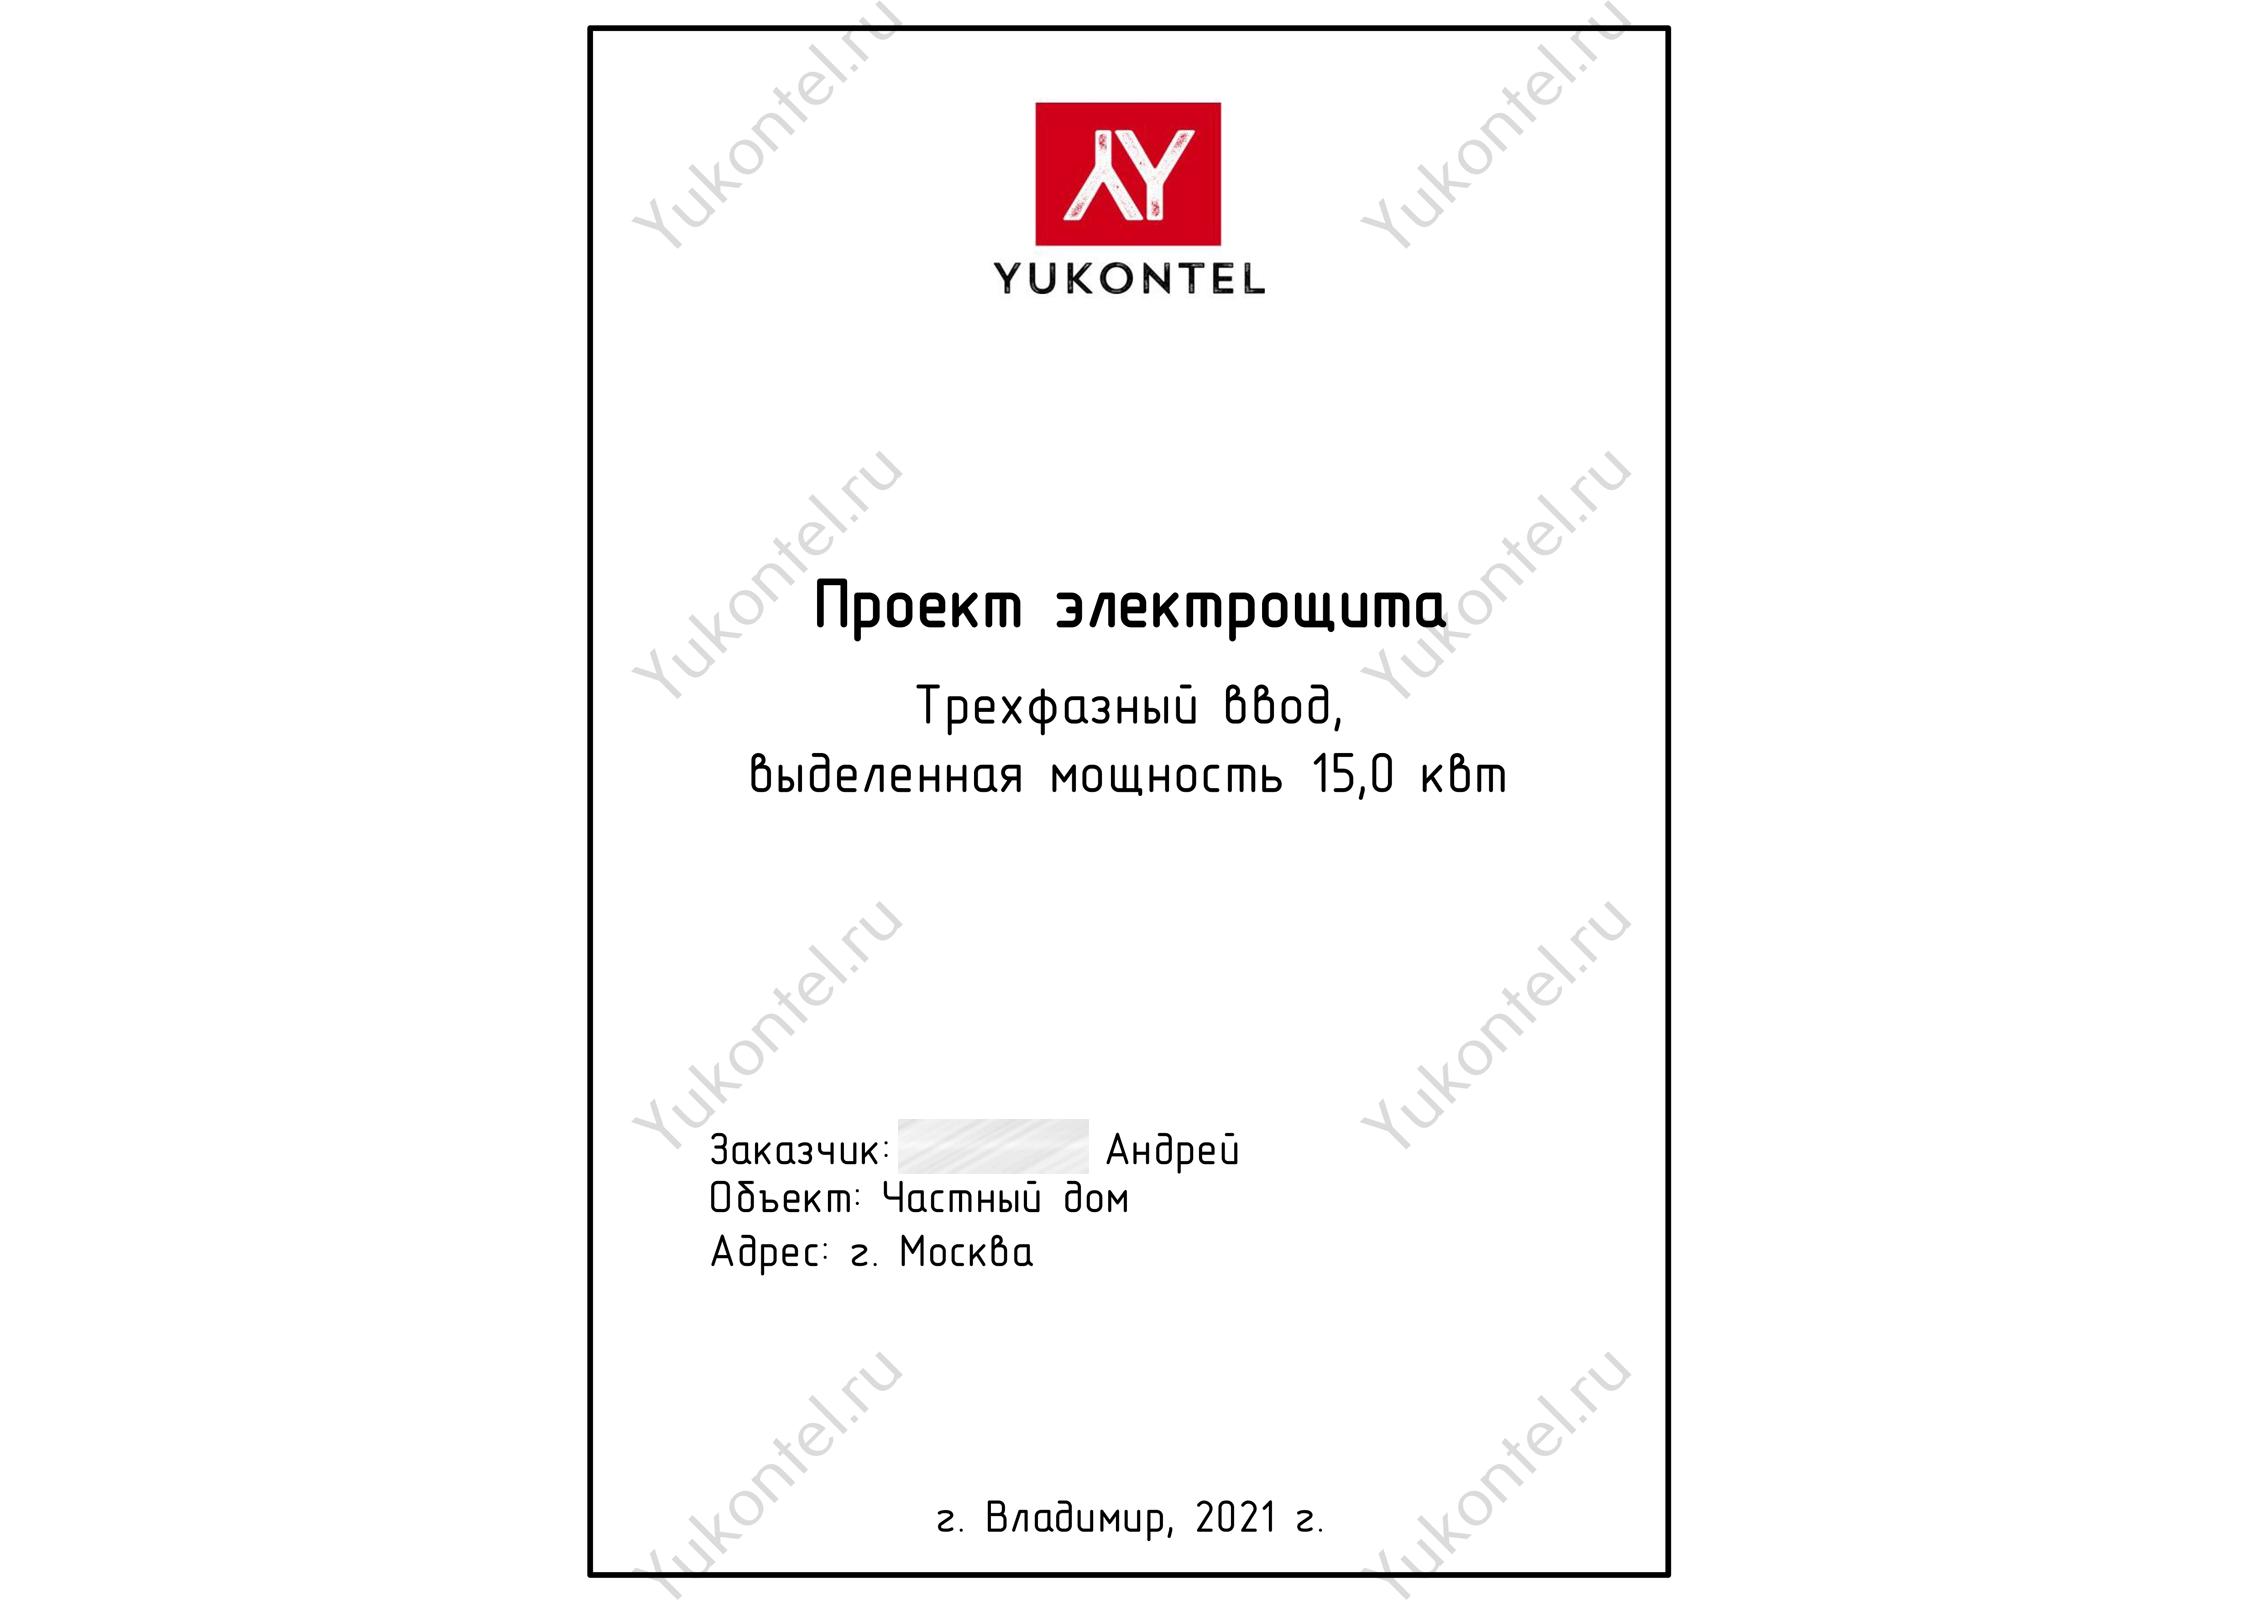 Проект электрощита чдом Москва Юконтел